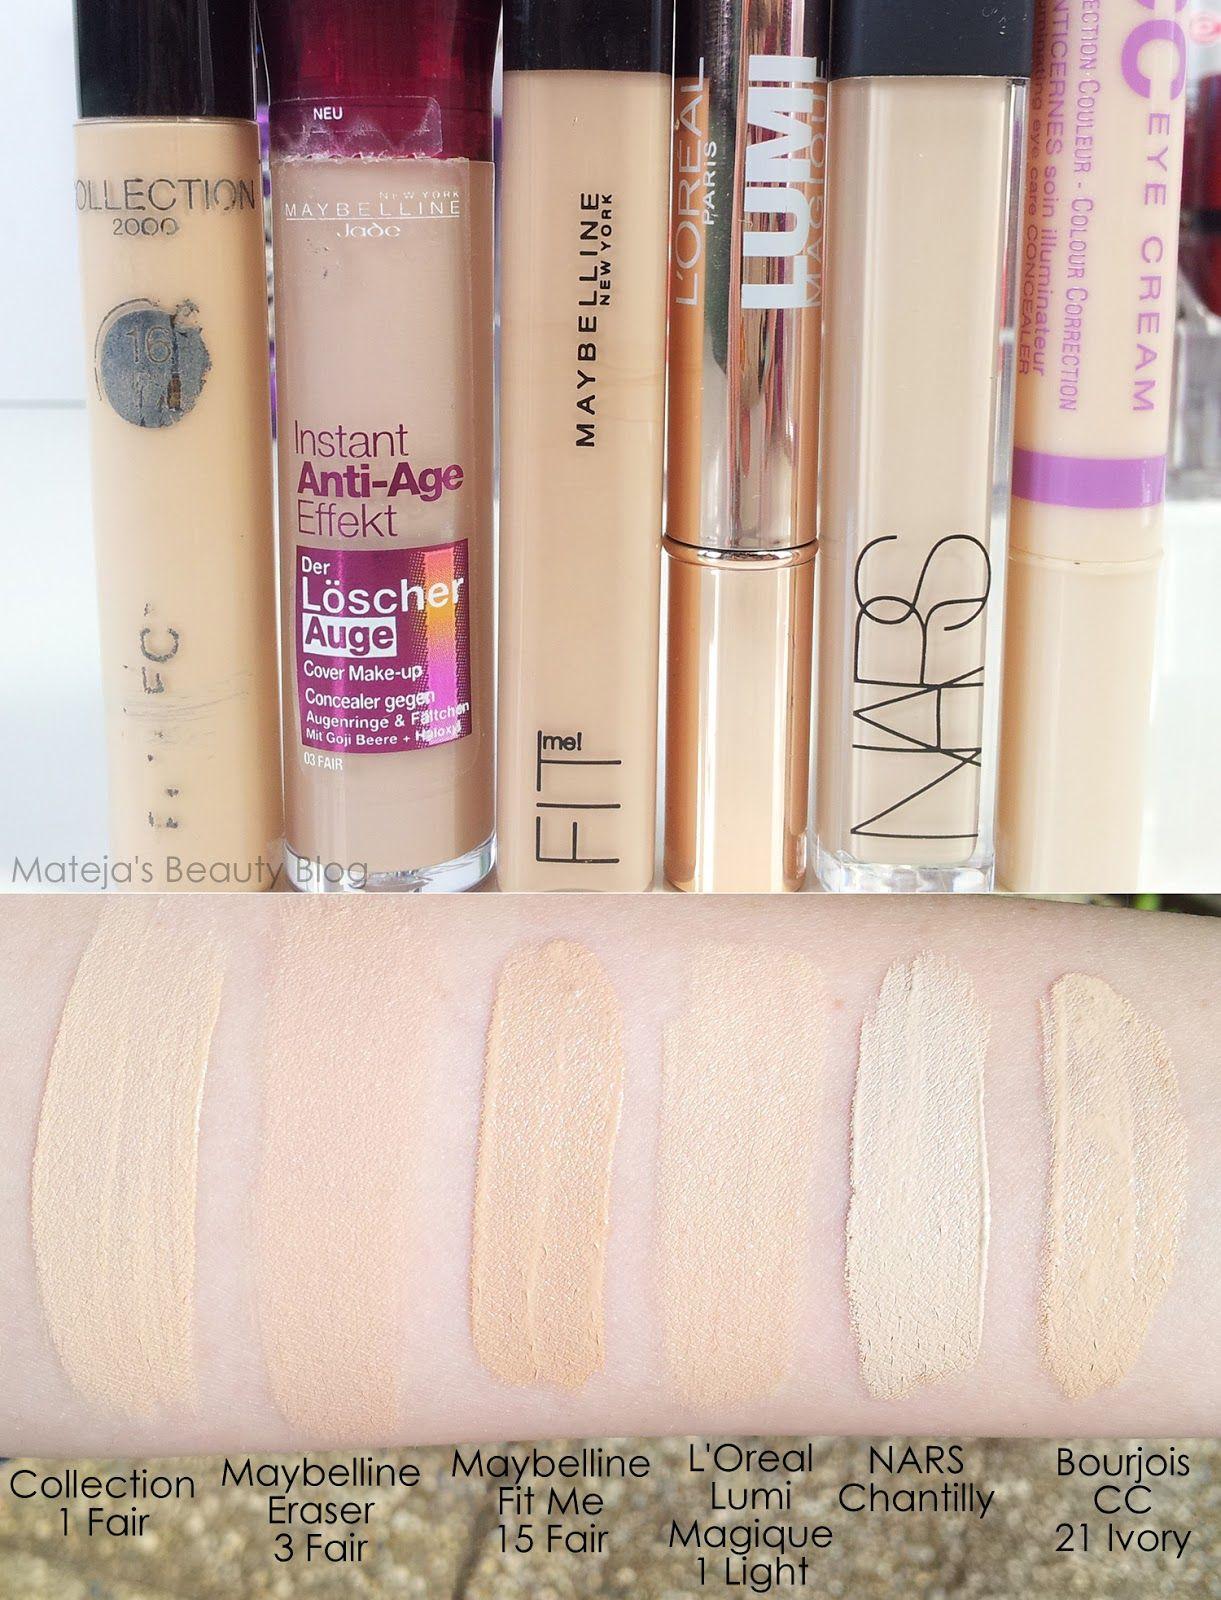 Matejas Beauty Blog Maybelline Fit Me Concealer 15 Fair